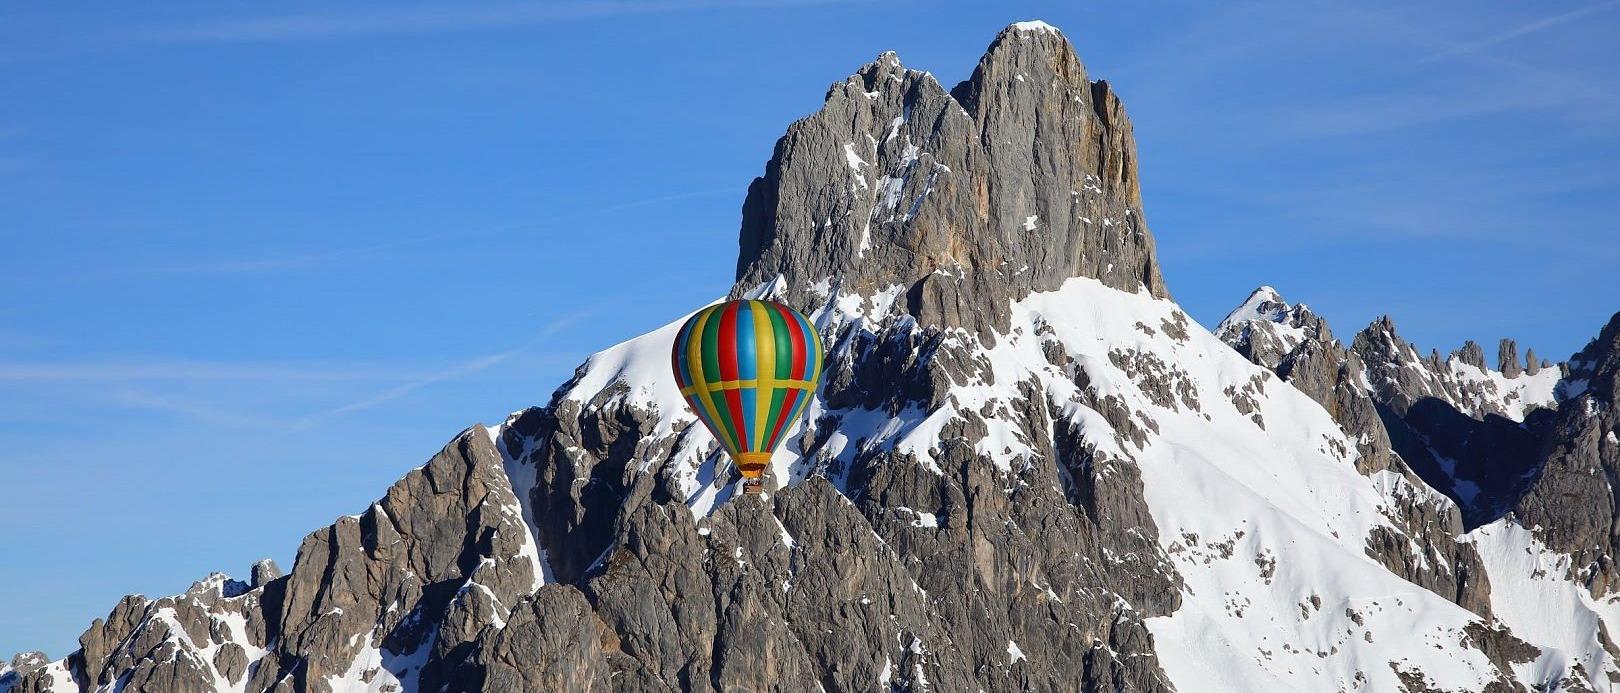 Ballonwoche Filzmoos Flachau Winterurlaub Familie Event Skiurlaub Salzburger Land Ballonfahren